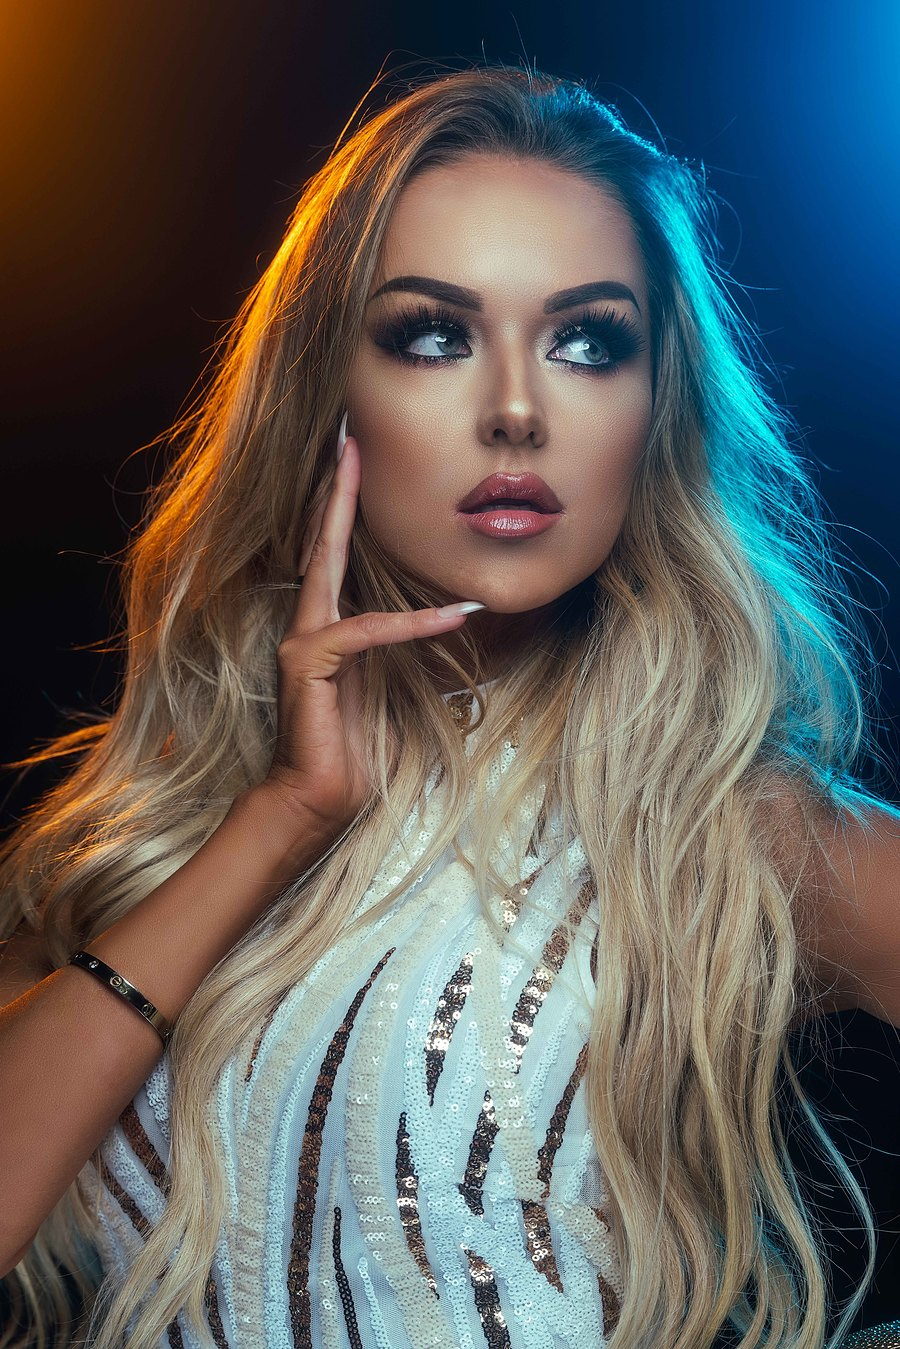 Photography by David Abbs, Model gabriella grigo, Makeup by gabriella grigo / Uploaded 2nd September 2018 @ 07:43 PM